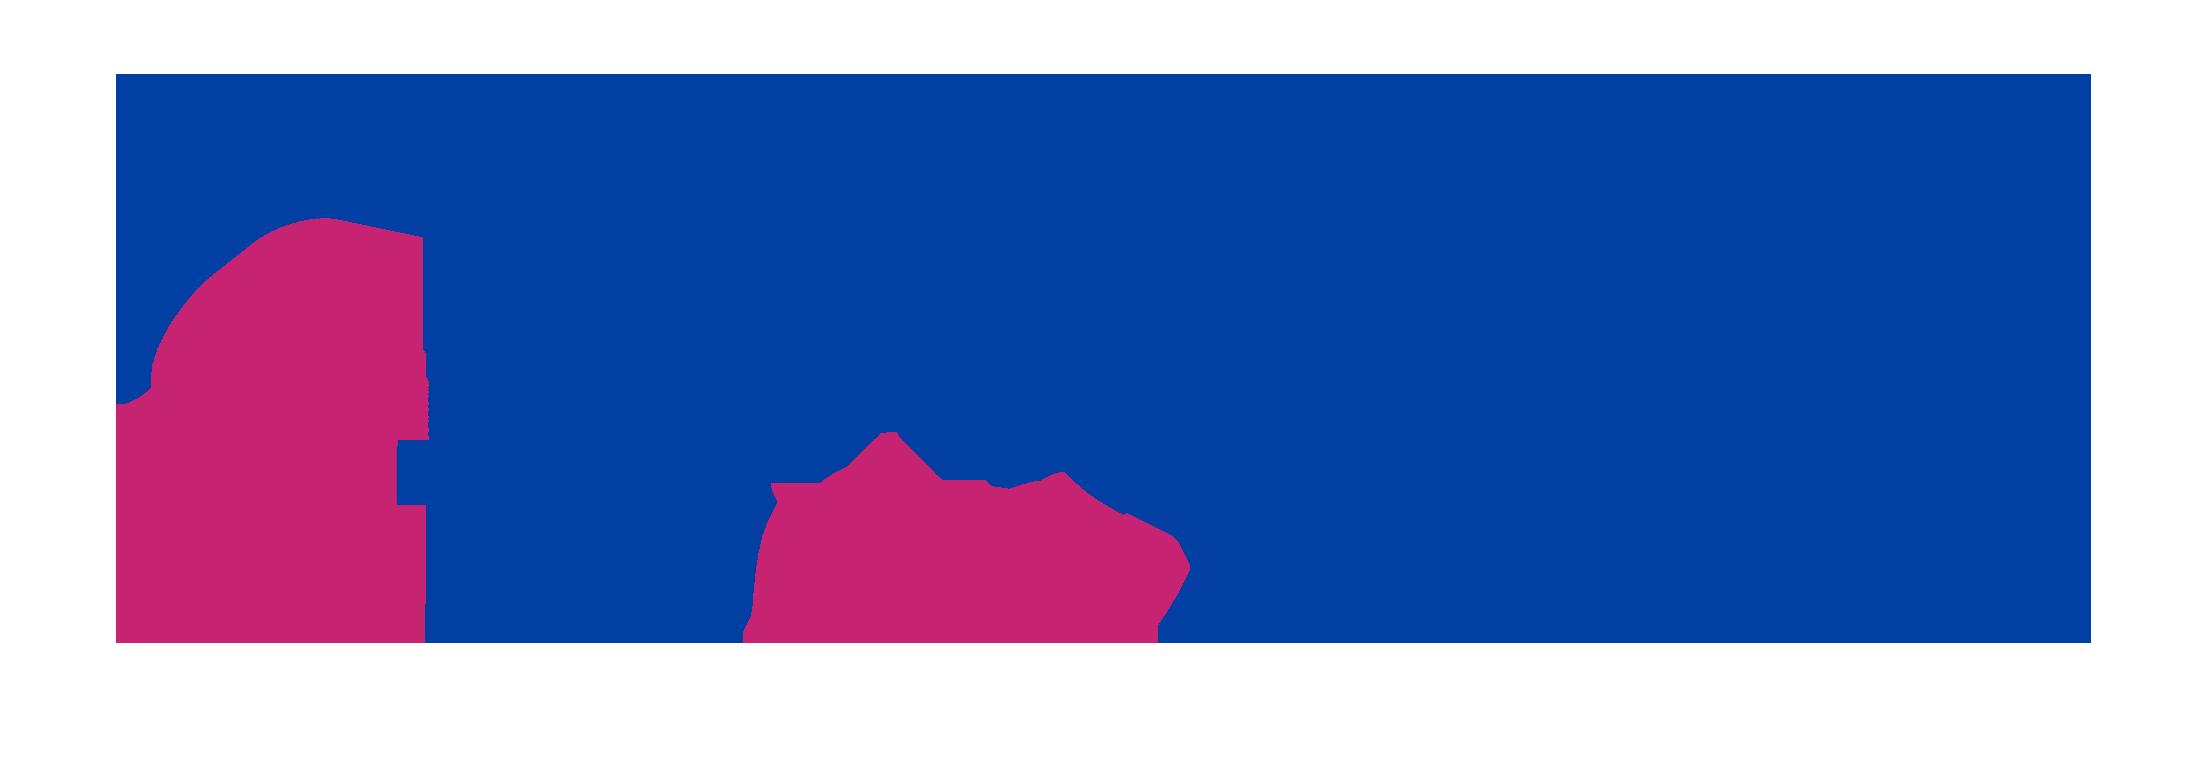 Convocazione Assemblea Nazionale di Professione in Famiglia